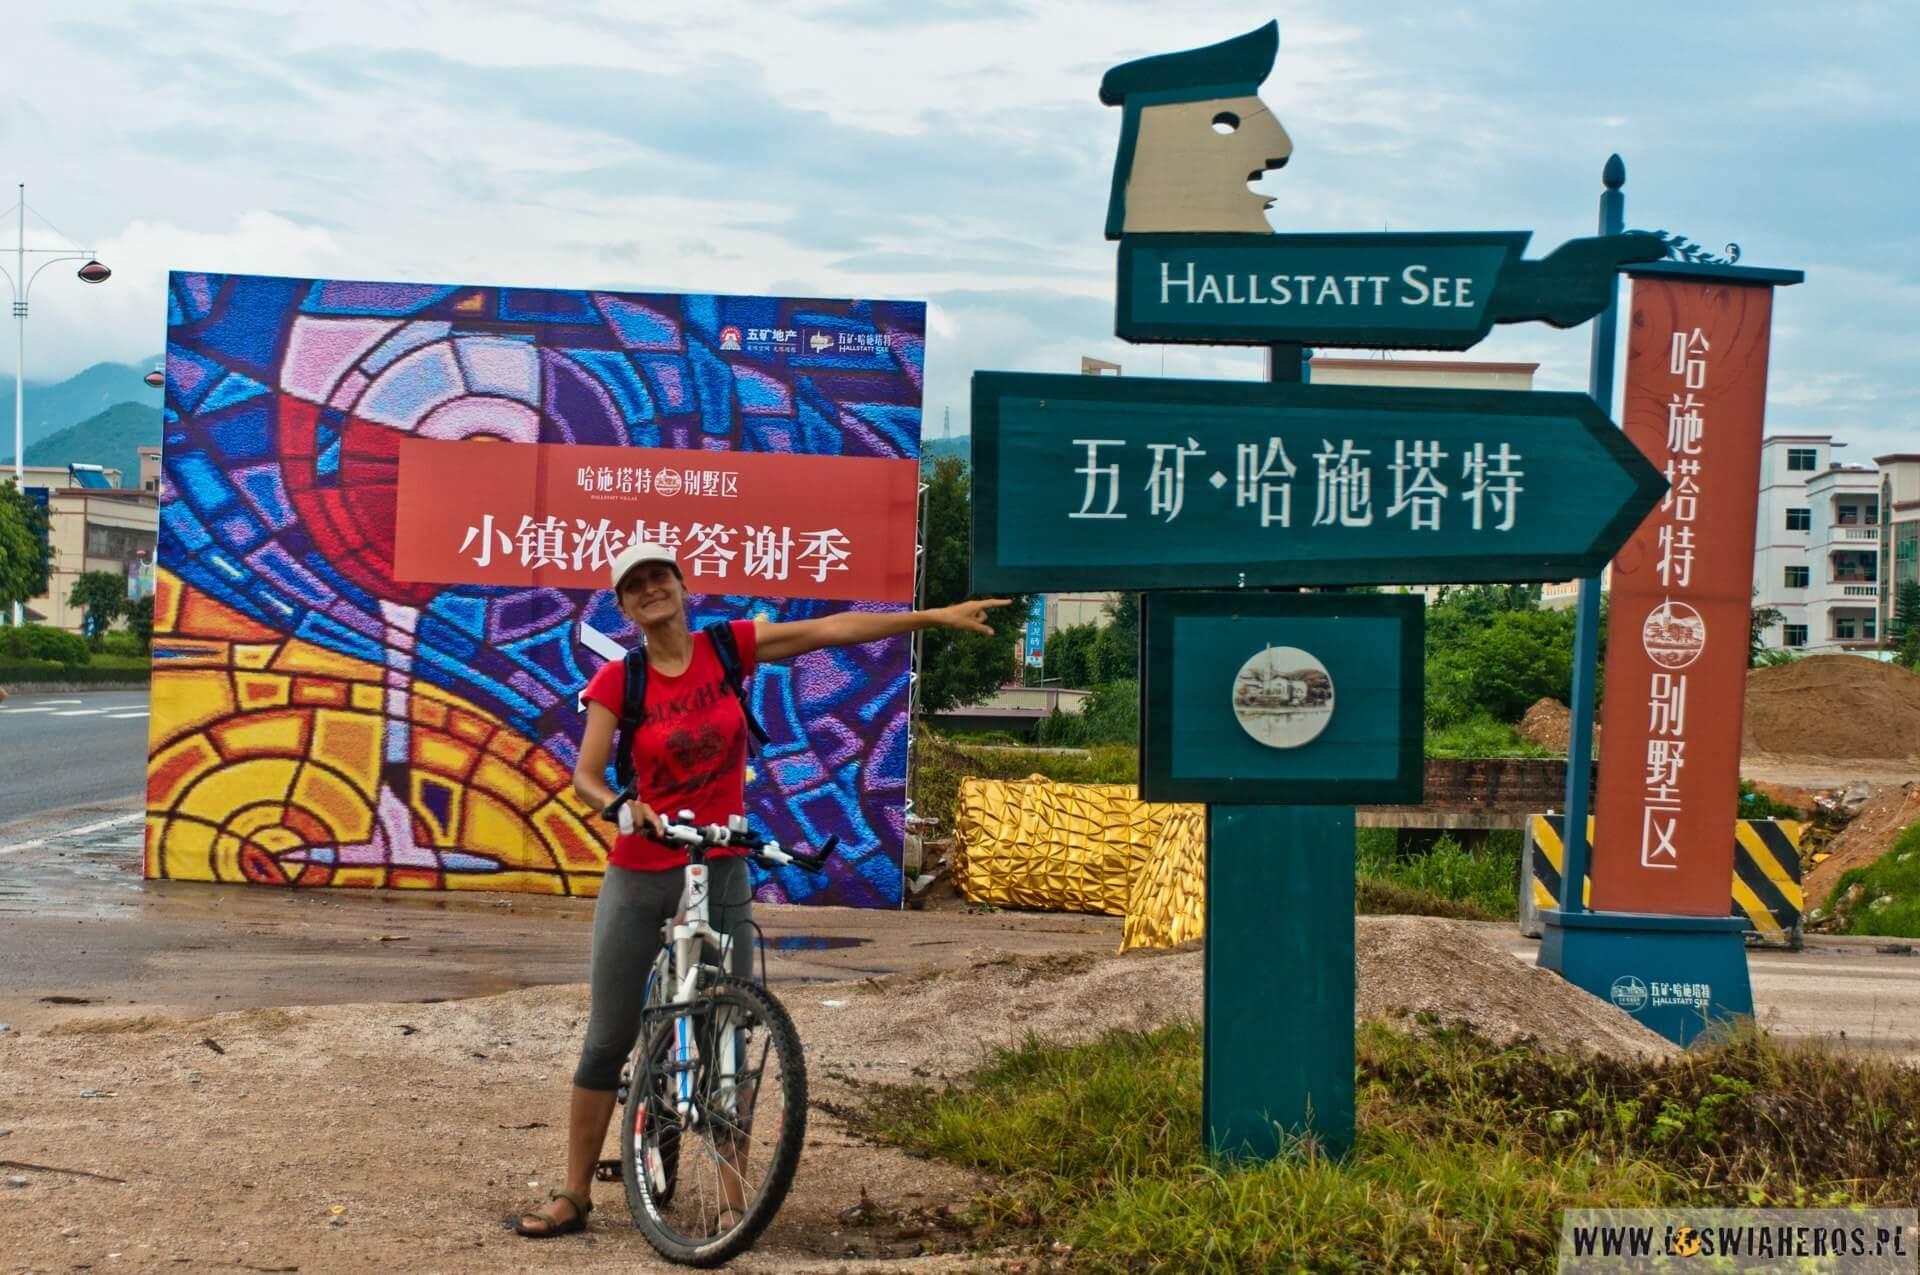 Chińskie miasto Hallstatt